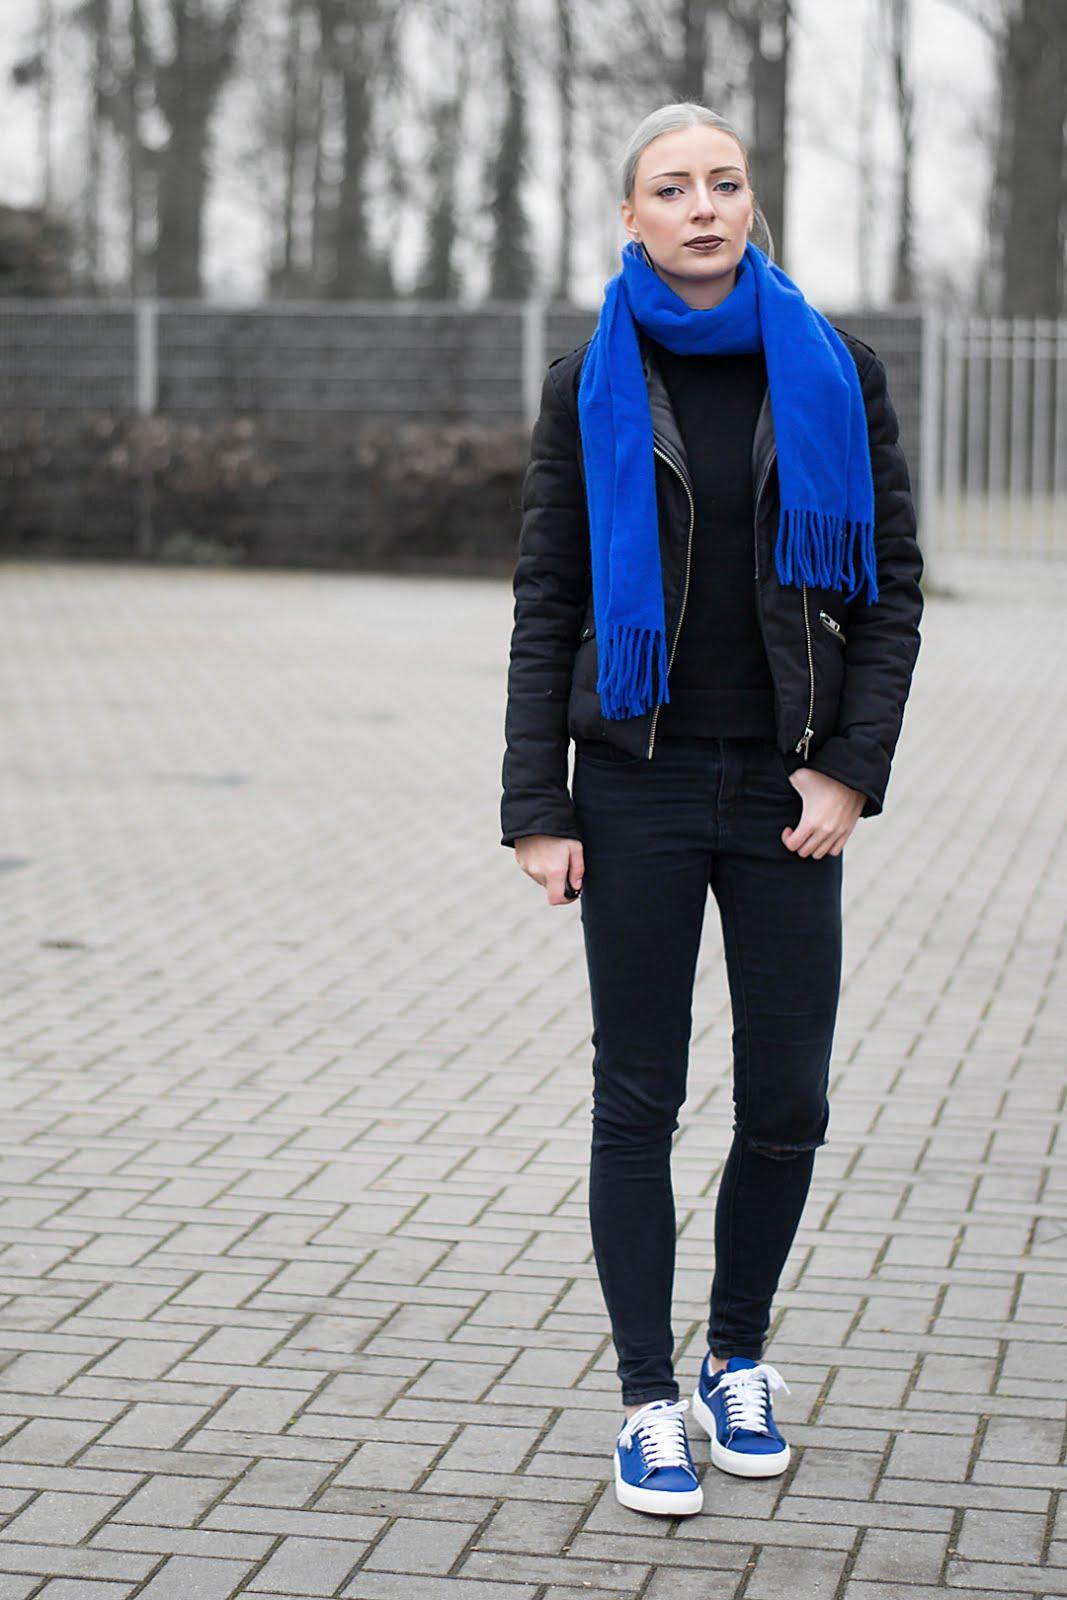 Outfitpost, cobalt blue accessoiries. Wearing karl lagerfeld sneakers and the kooples jacket